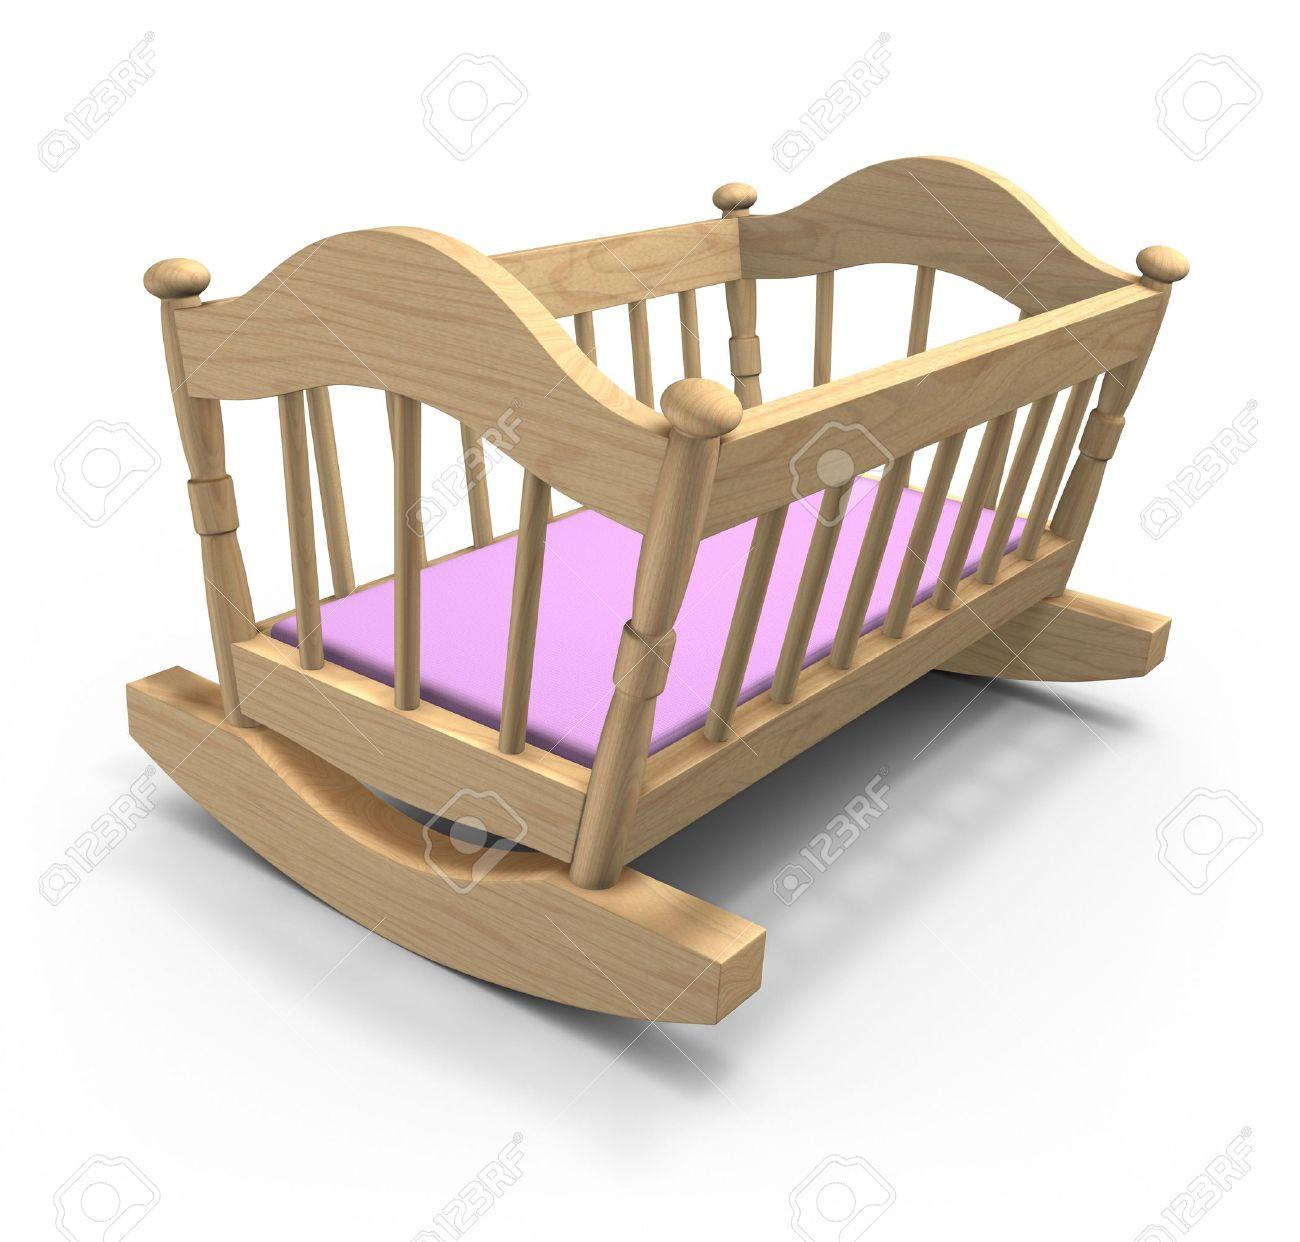 Baby cribs and cradles - Stock Photo Wooden Cradle